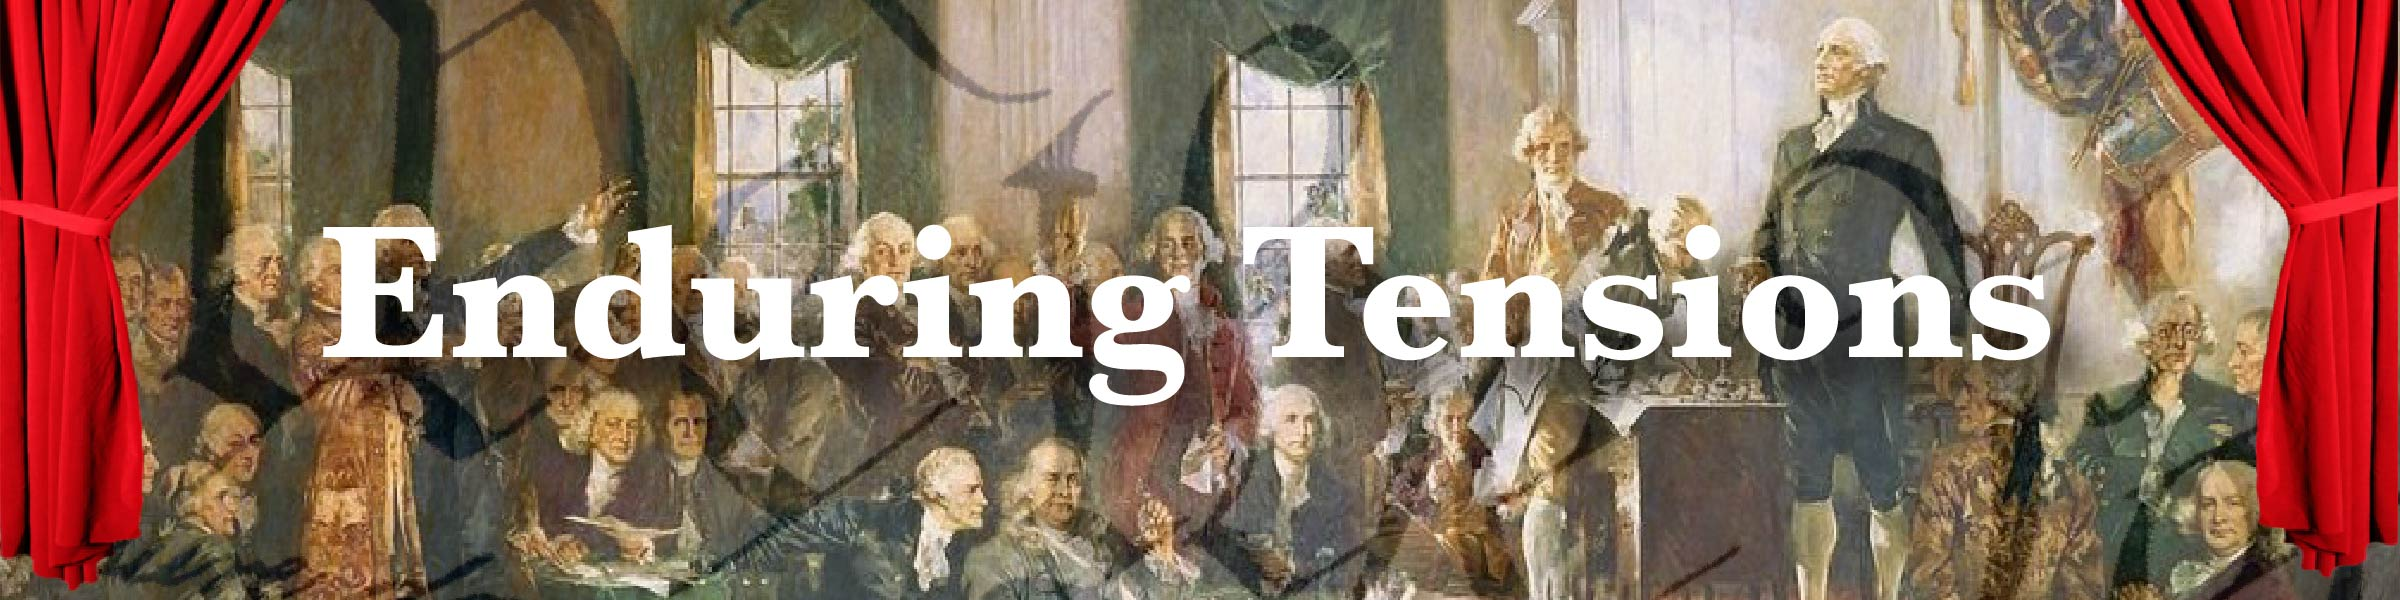 Enduring Tensions